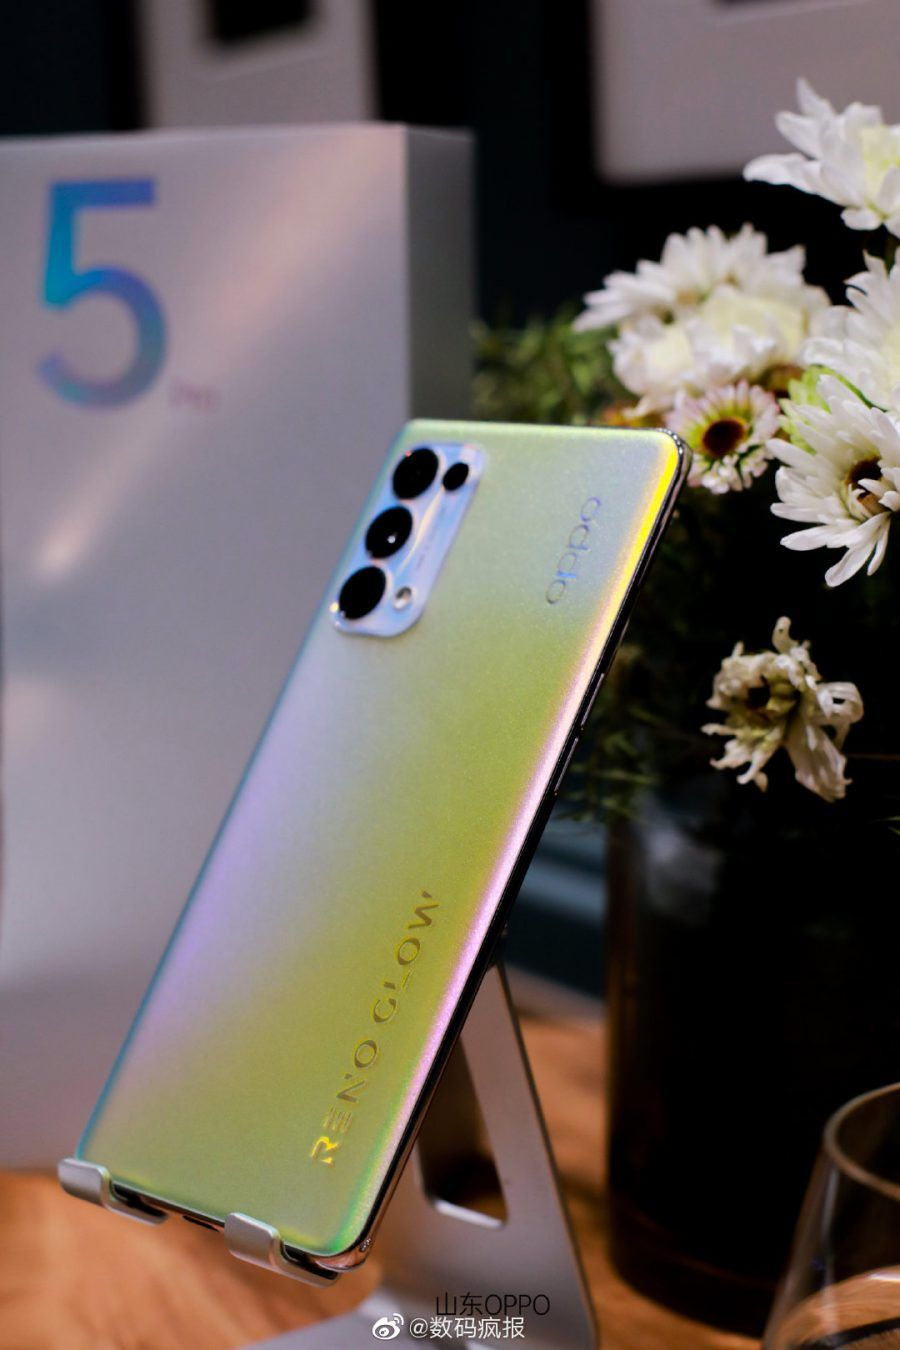 Reno5Pro 9 Android 11, china, gama-média, imagens reais, oppo, OPPO Reno 5, Reno 5 Pro, smartphone, topo de gama